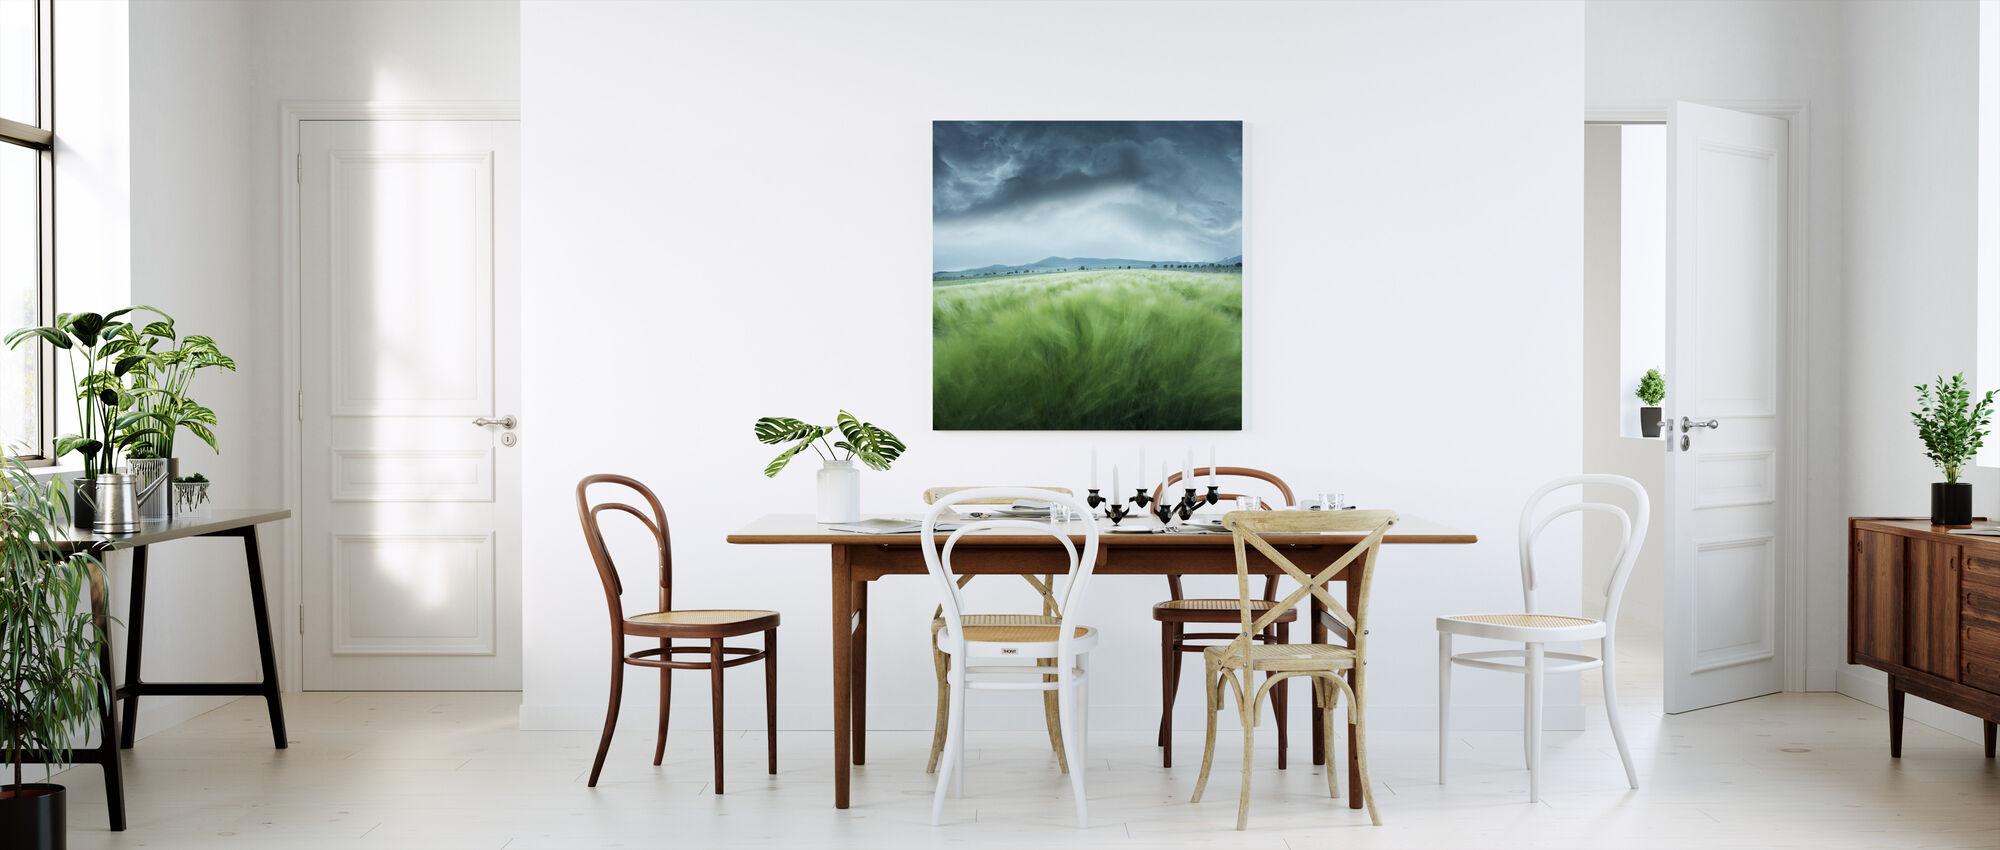 Green Barley Field - Canvas print - Kitchen